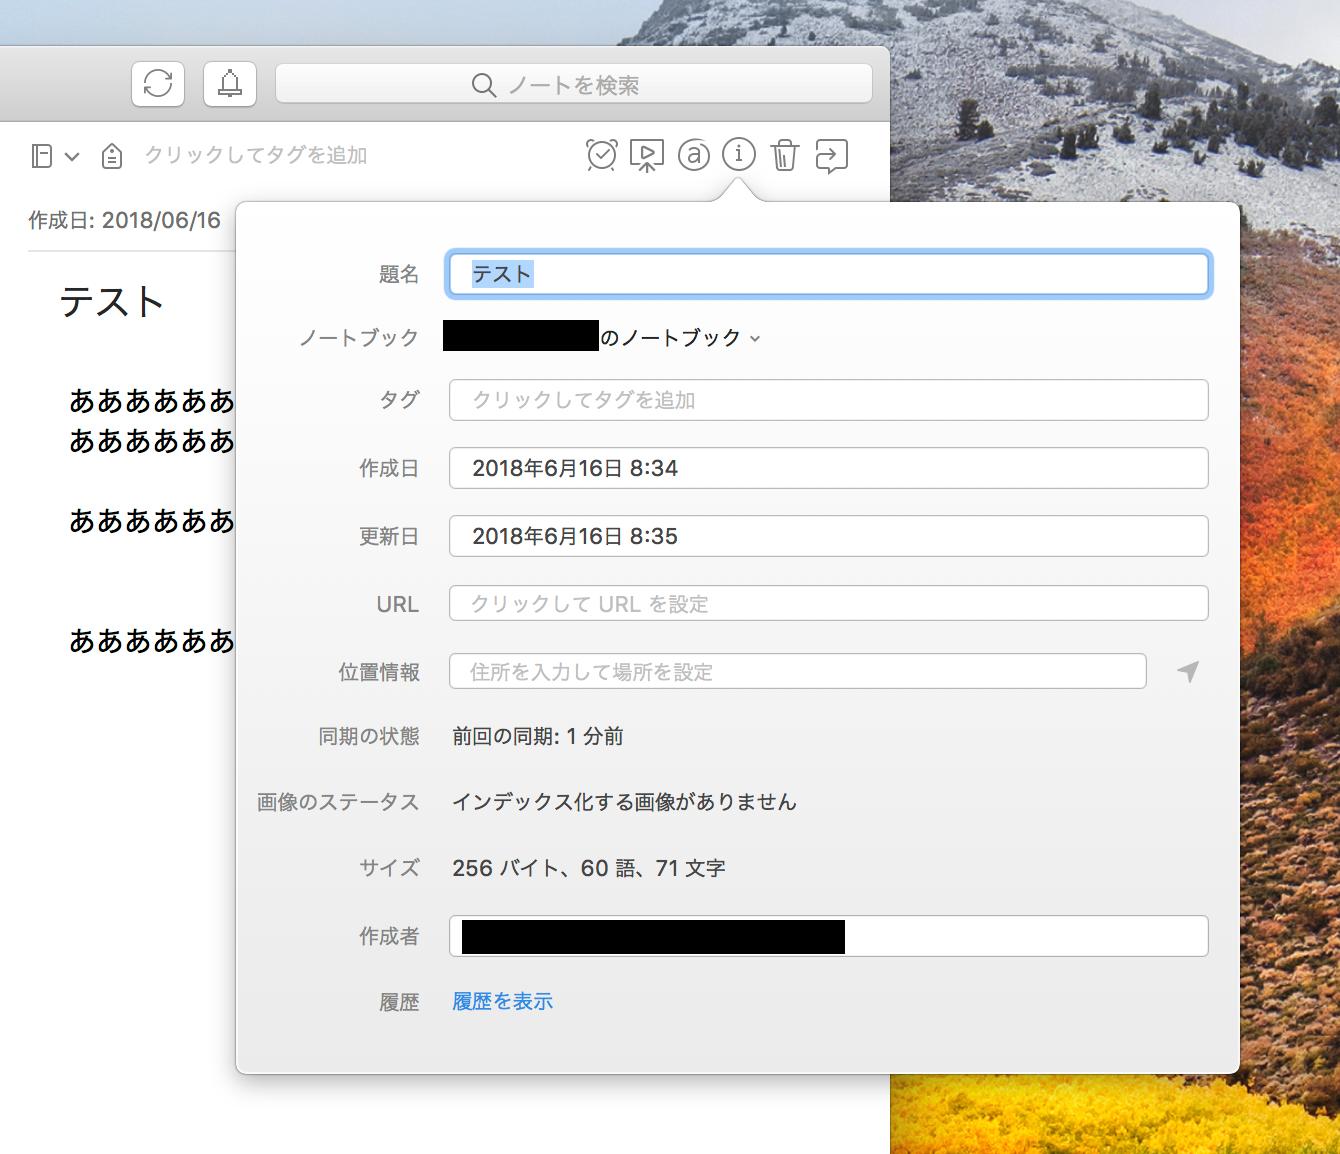 EvernoteのMac版で文字数を見る